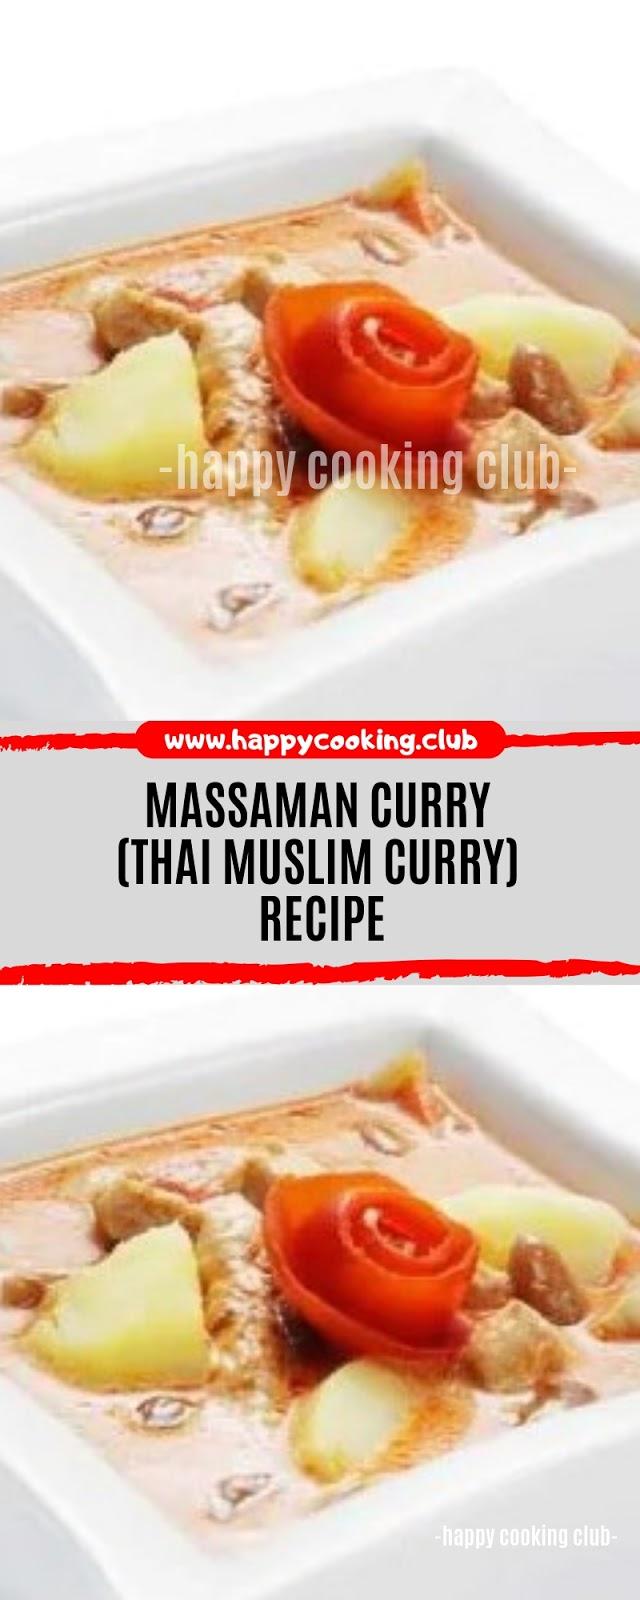 Massaman Curry (Thai Muslim Curry) Recipe